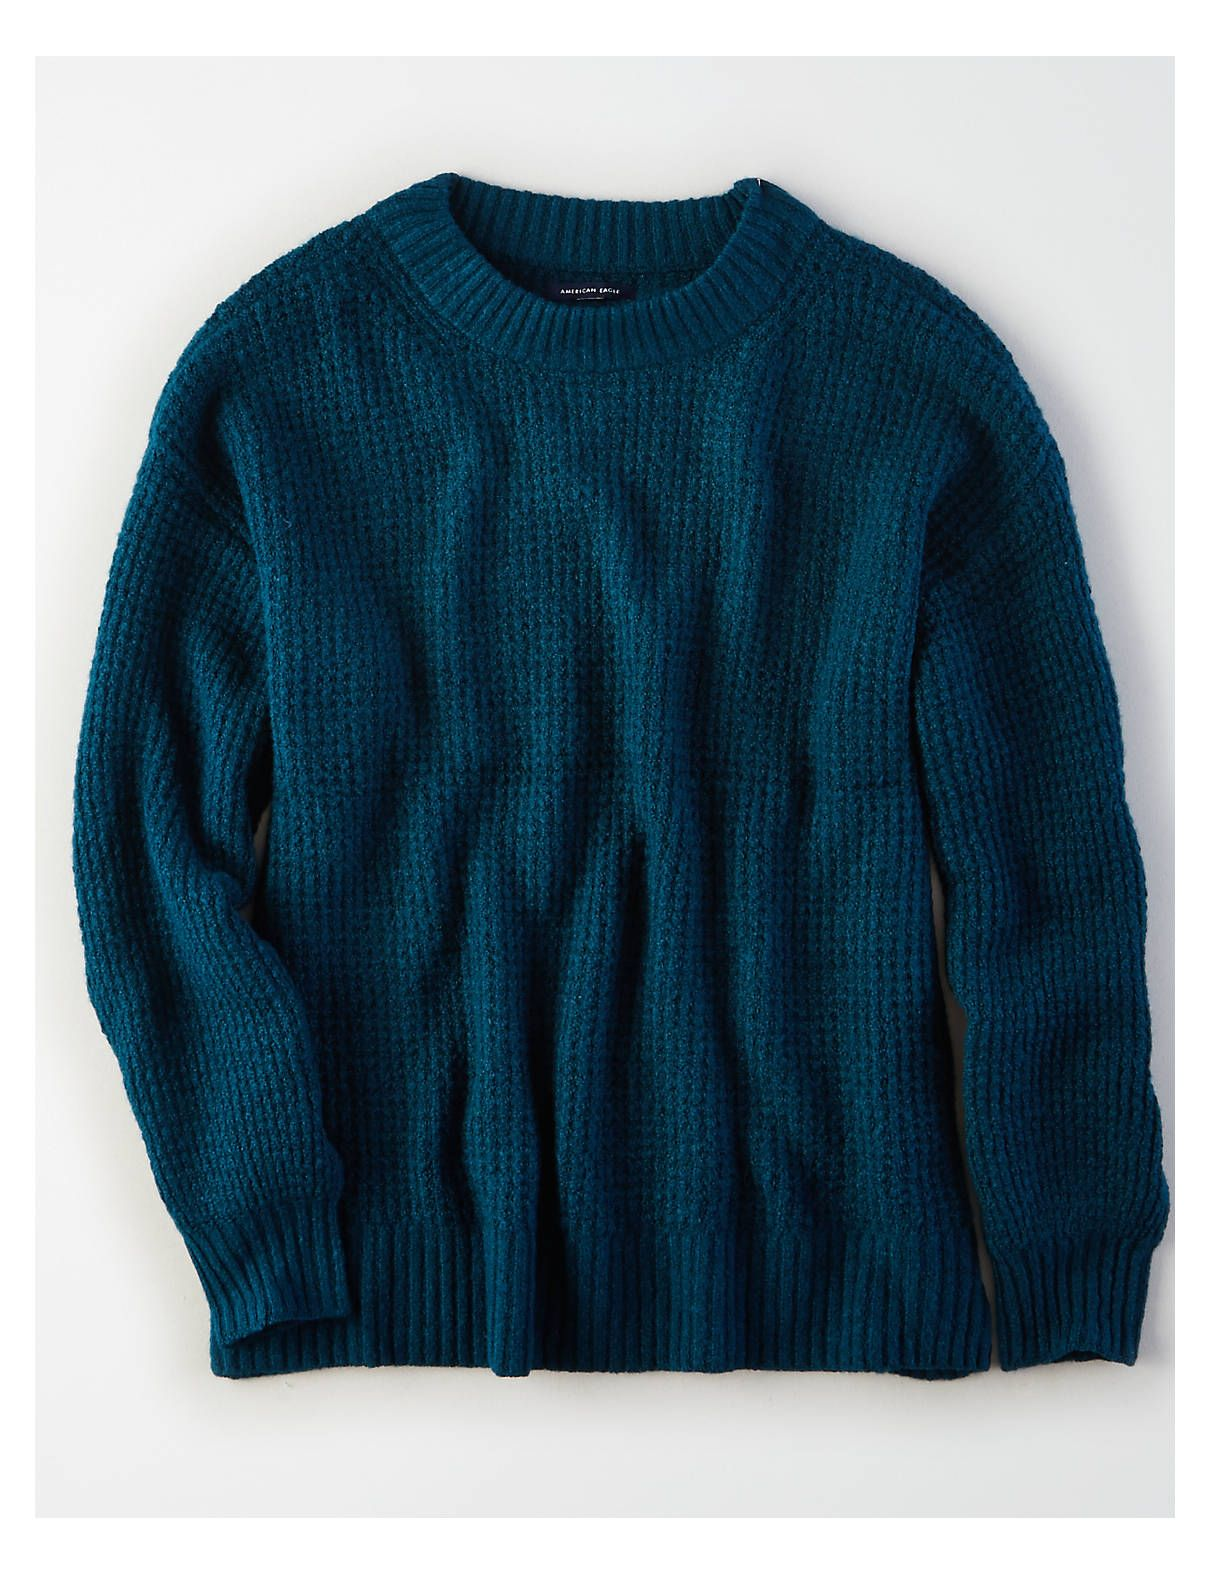 cfc3d0e368e AE Cloudspun Sweater